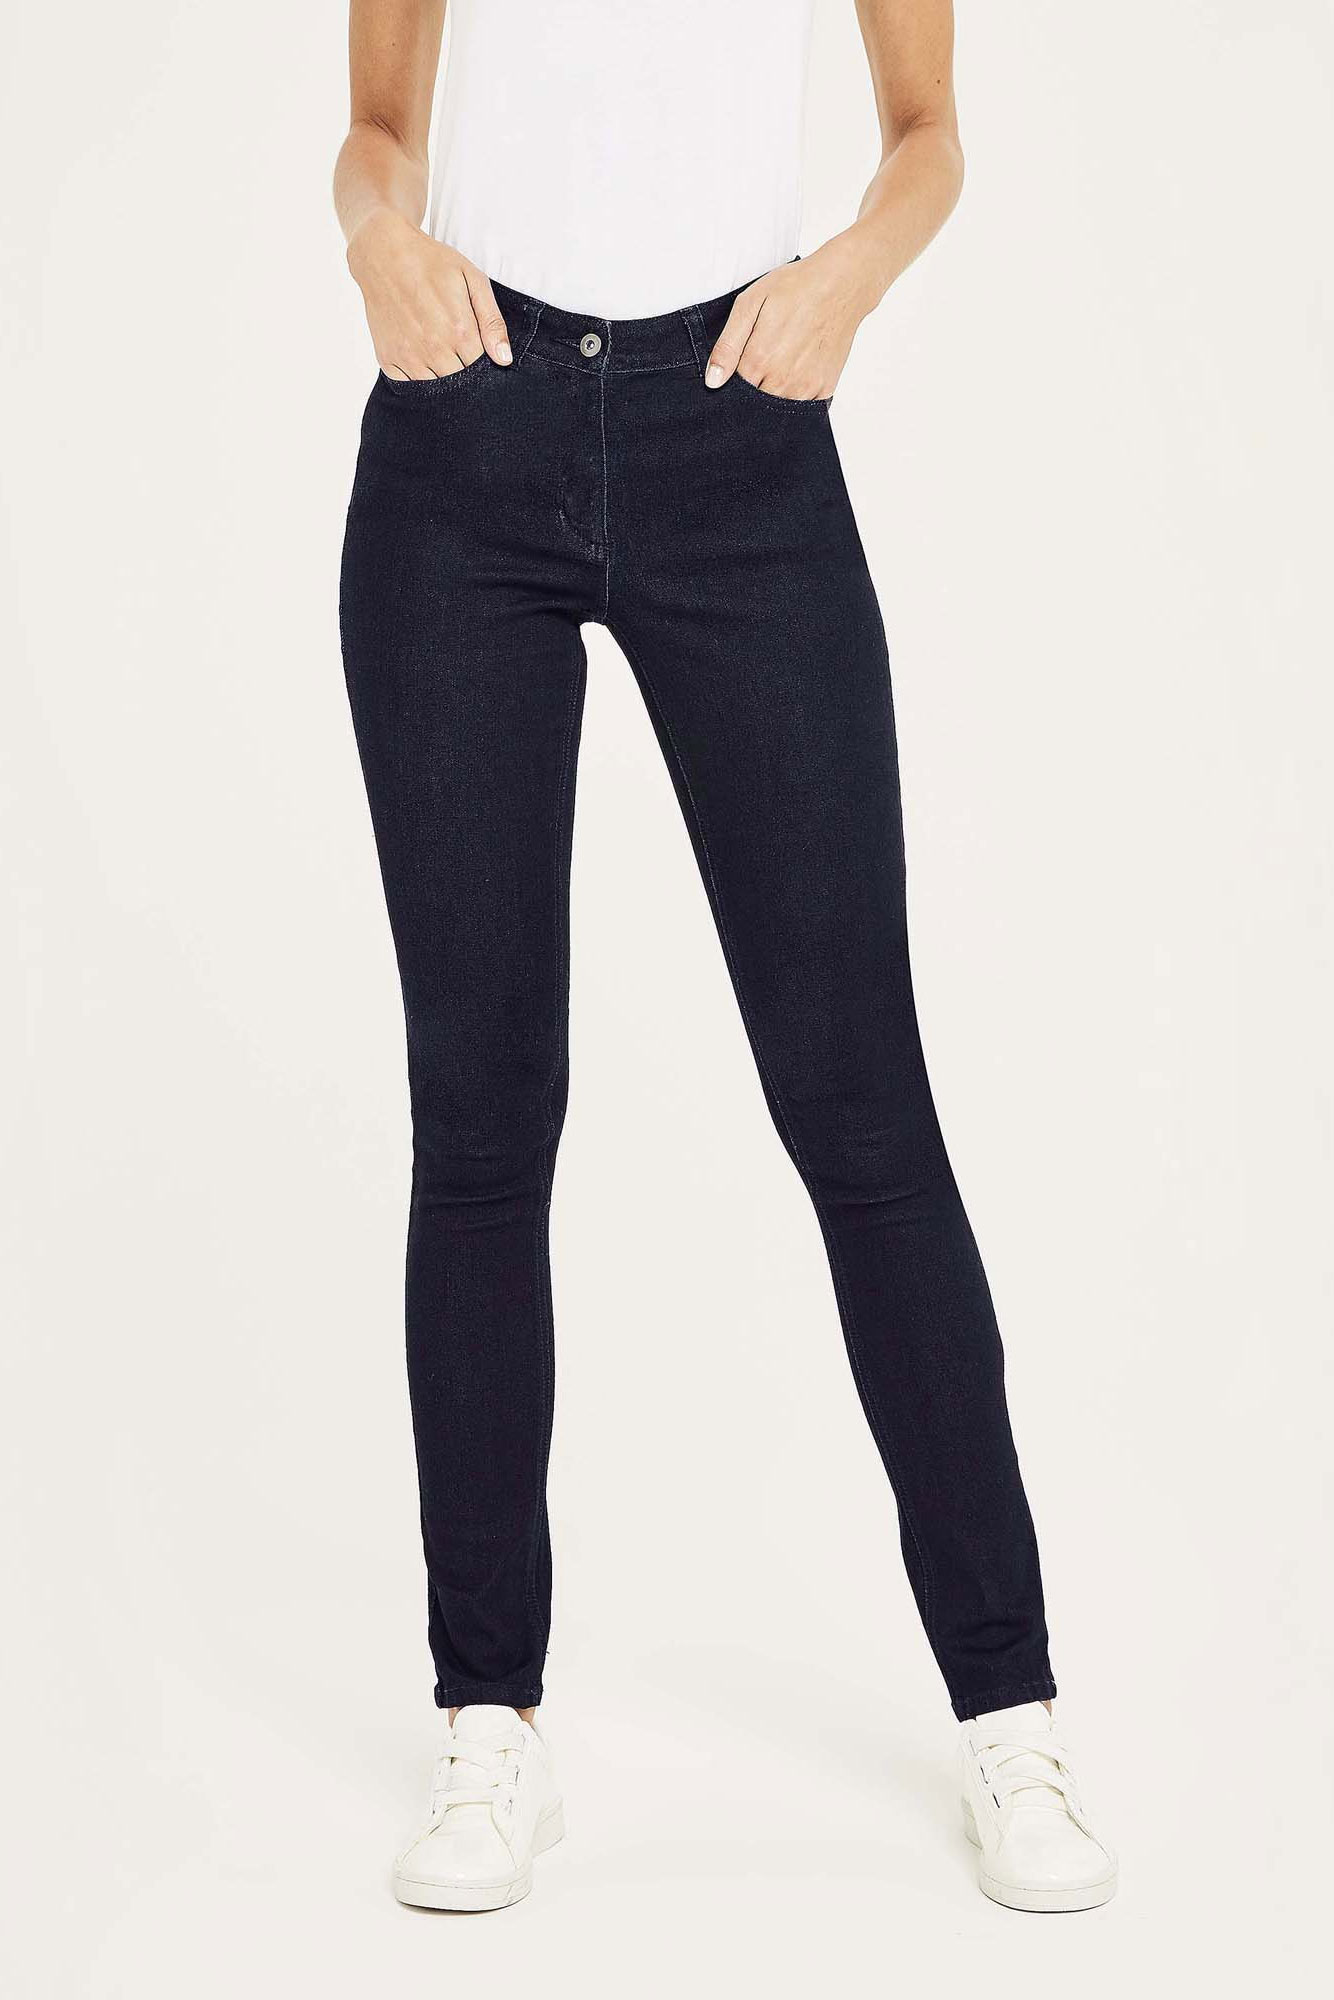 Dark Indigo Skinny Low Rise Jeans_754095a.jpg